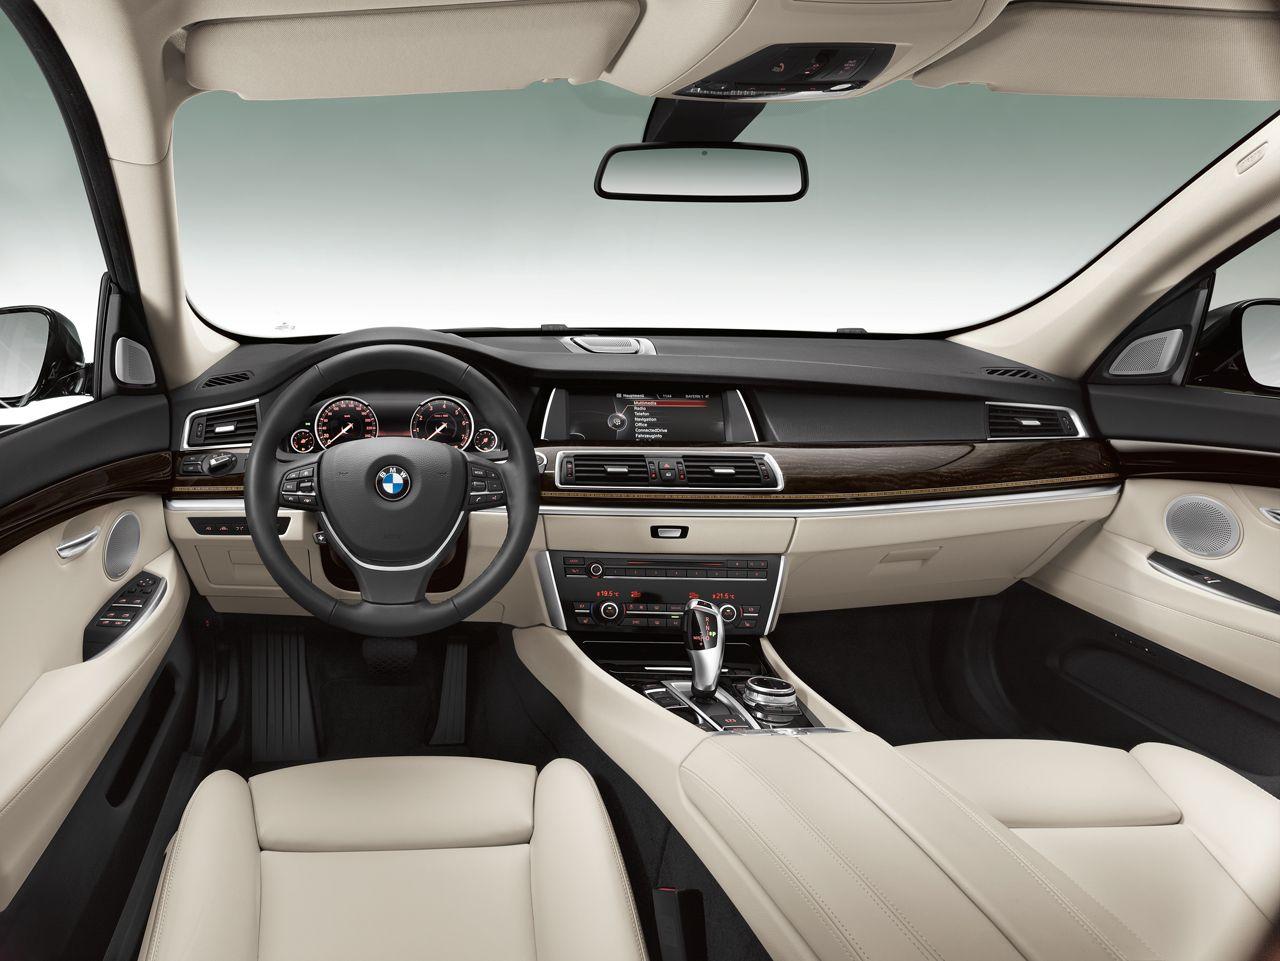 2014 Bmw 5 Series Gran Turismo Interior Bmw Bmw 535 Bmw 5 Series